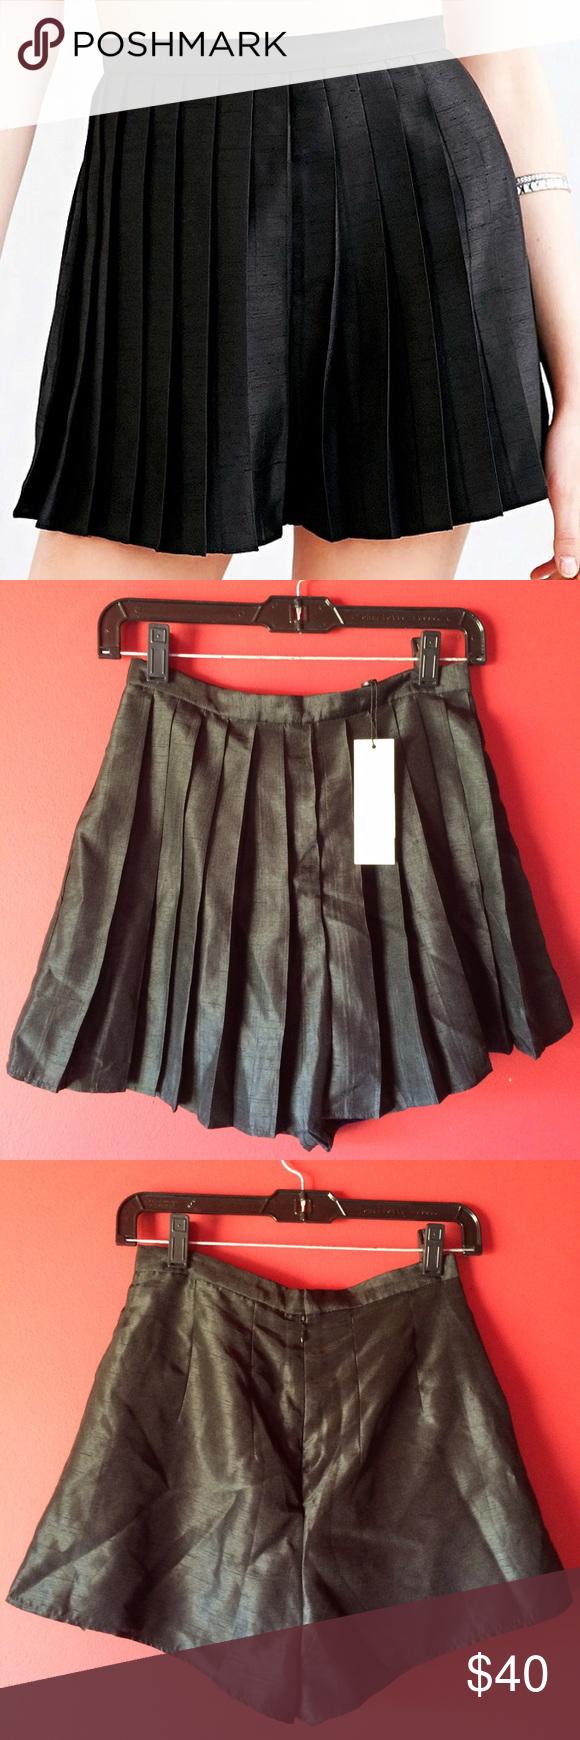 Keepsake From Above Shorts in Black Black skort with a pleated front. Keepsake Shorts Skorts